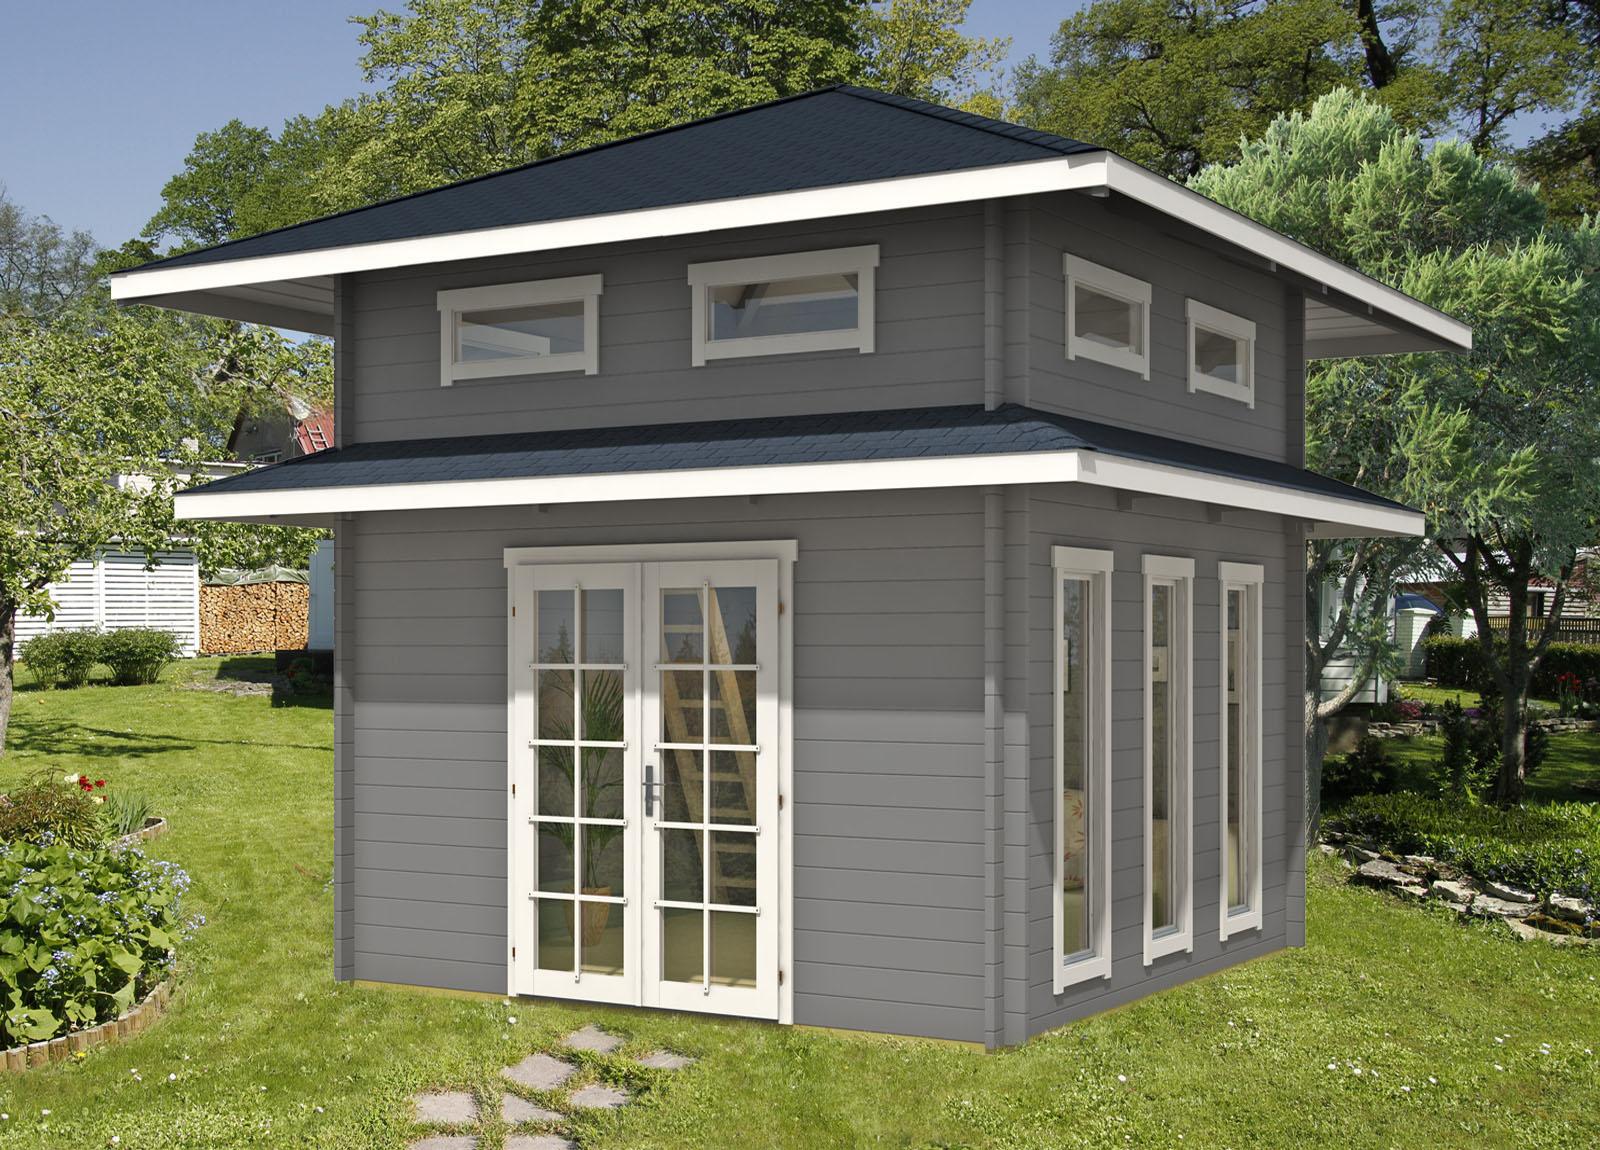 gartenhaus nebraska 44 gartenhaus nebraska 44. Black Bedroom Furniture Sets. Home Design Ideas